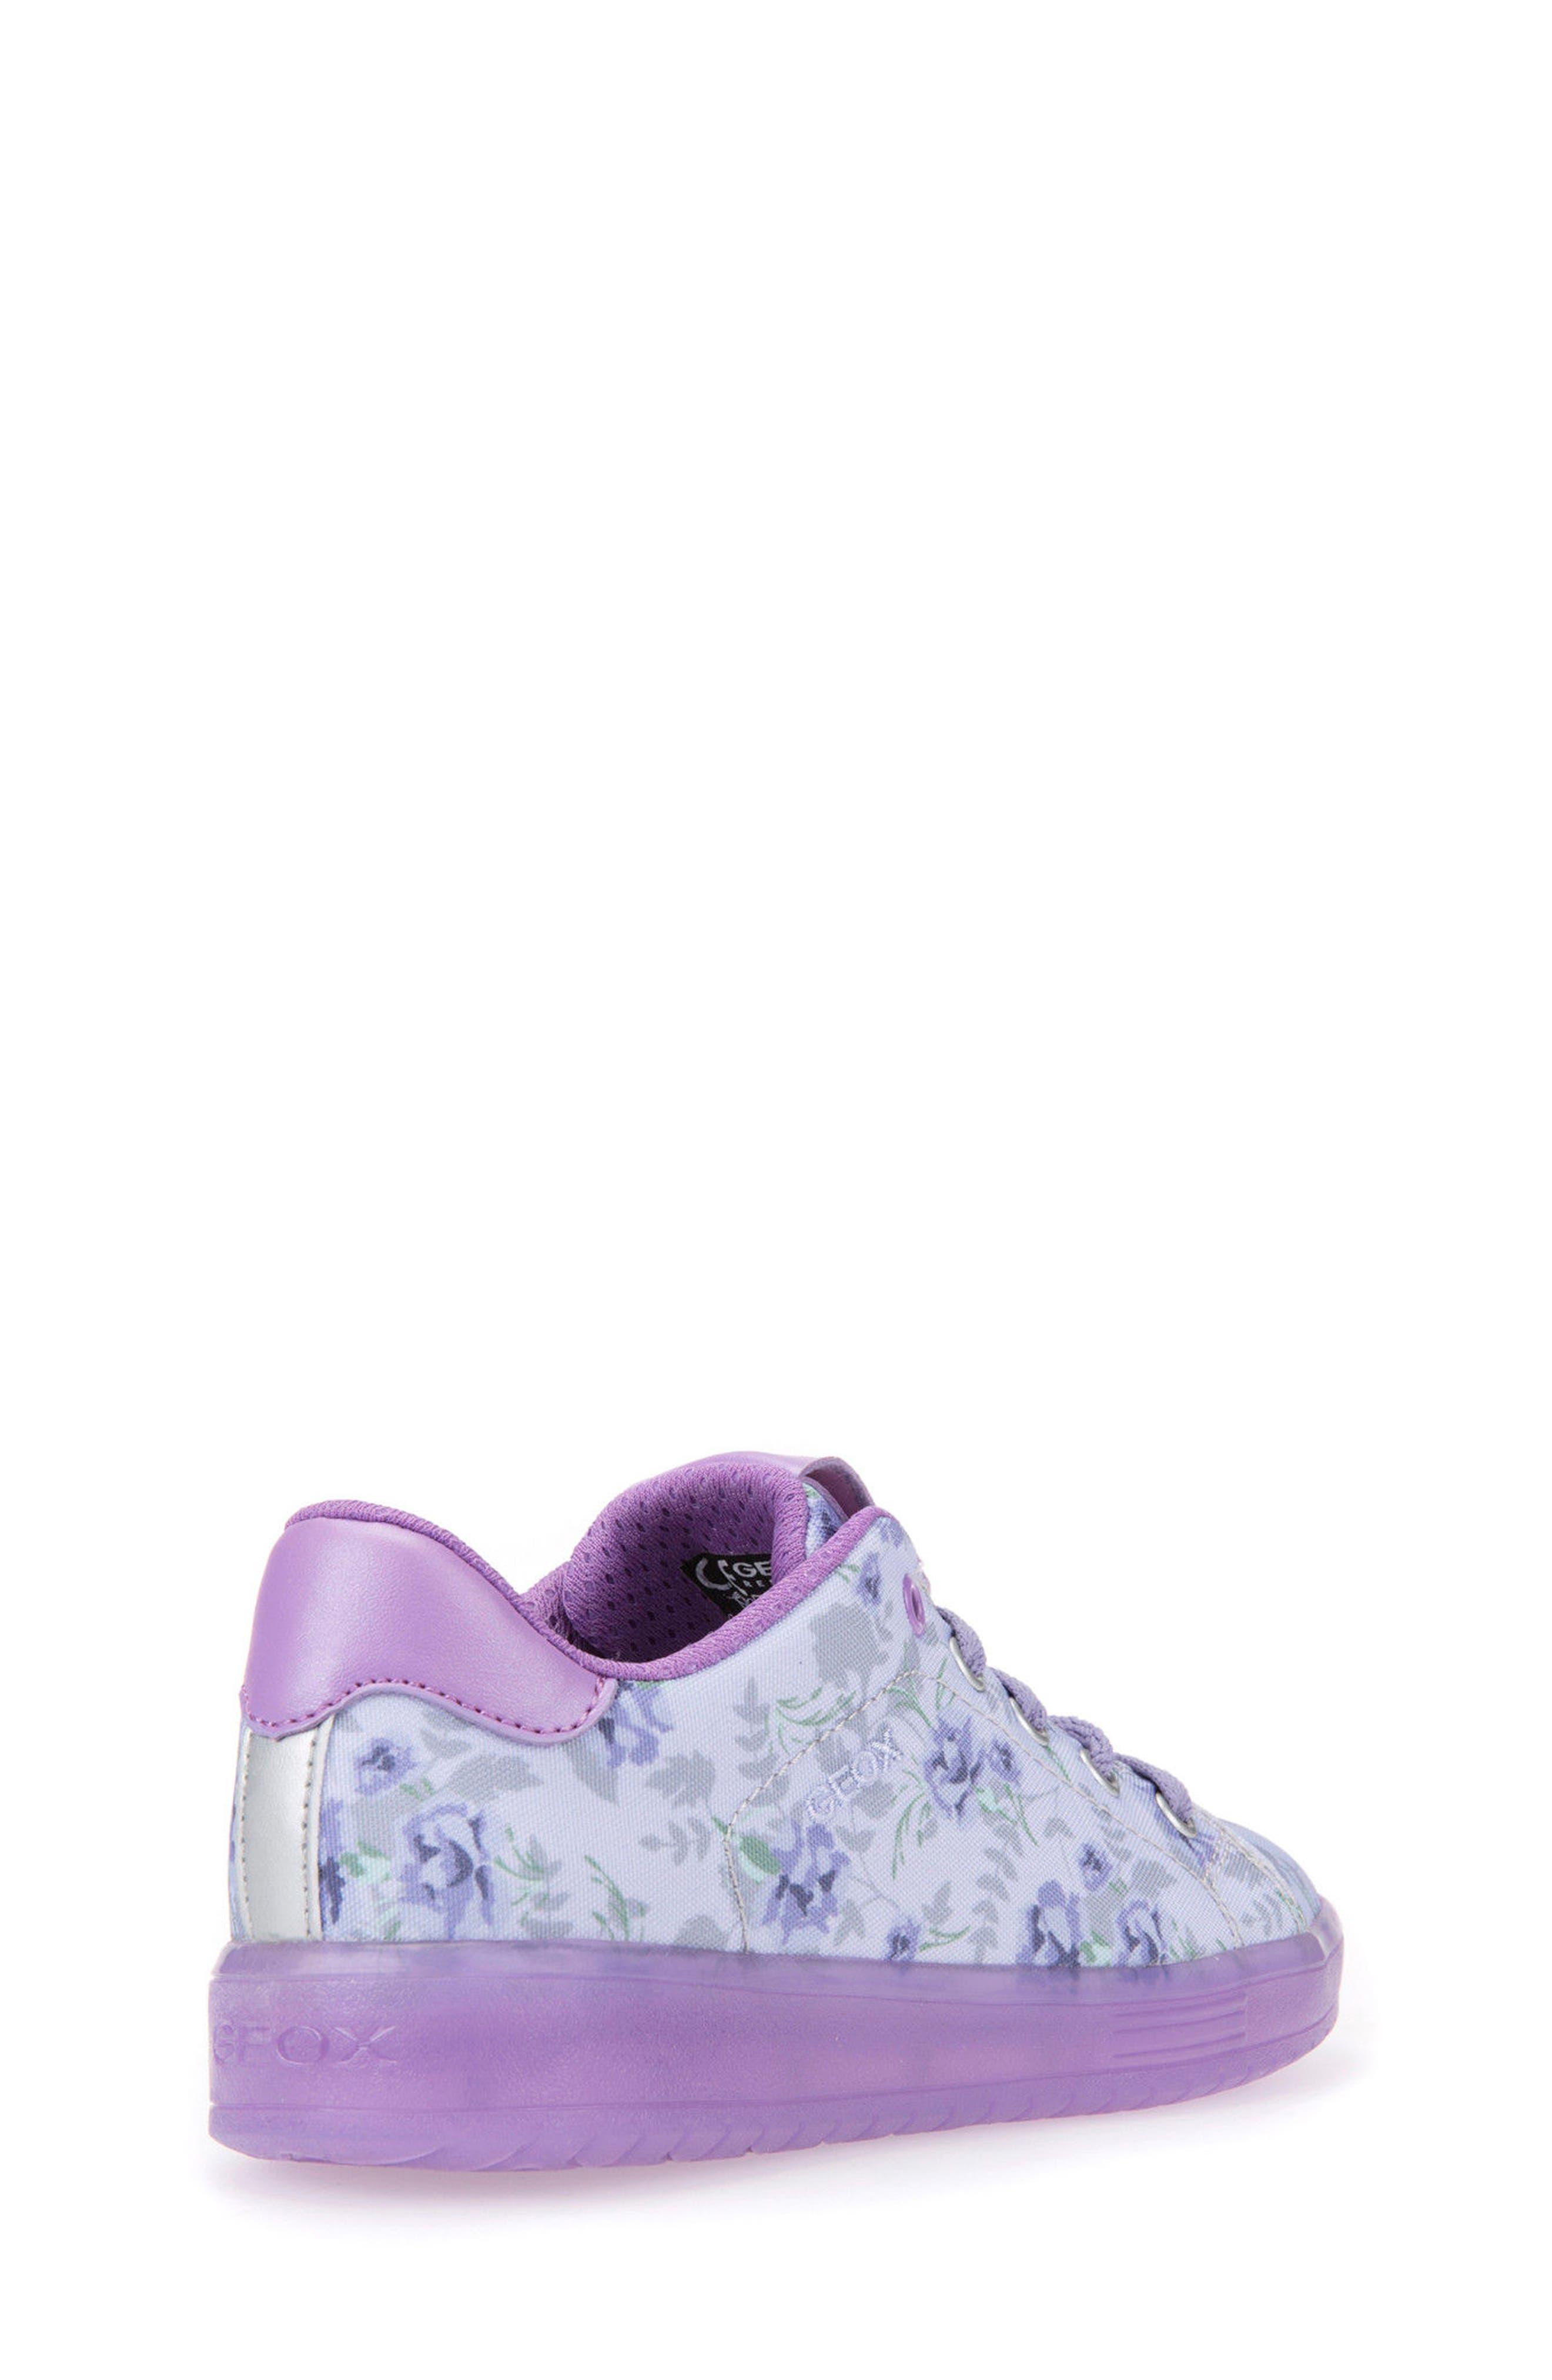 Alternate Image 2  - Geox Kommodor Light-Up Sneaker (Toddler, Little Kid & Big Kid)